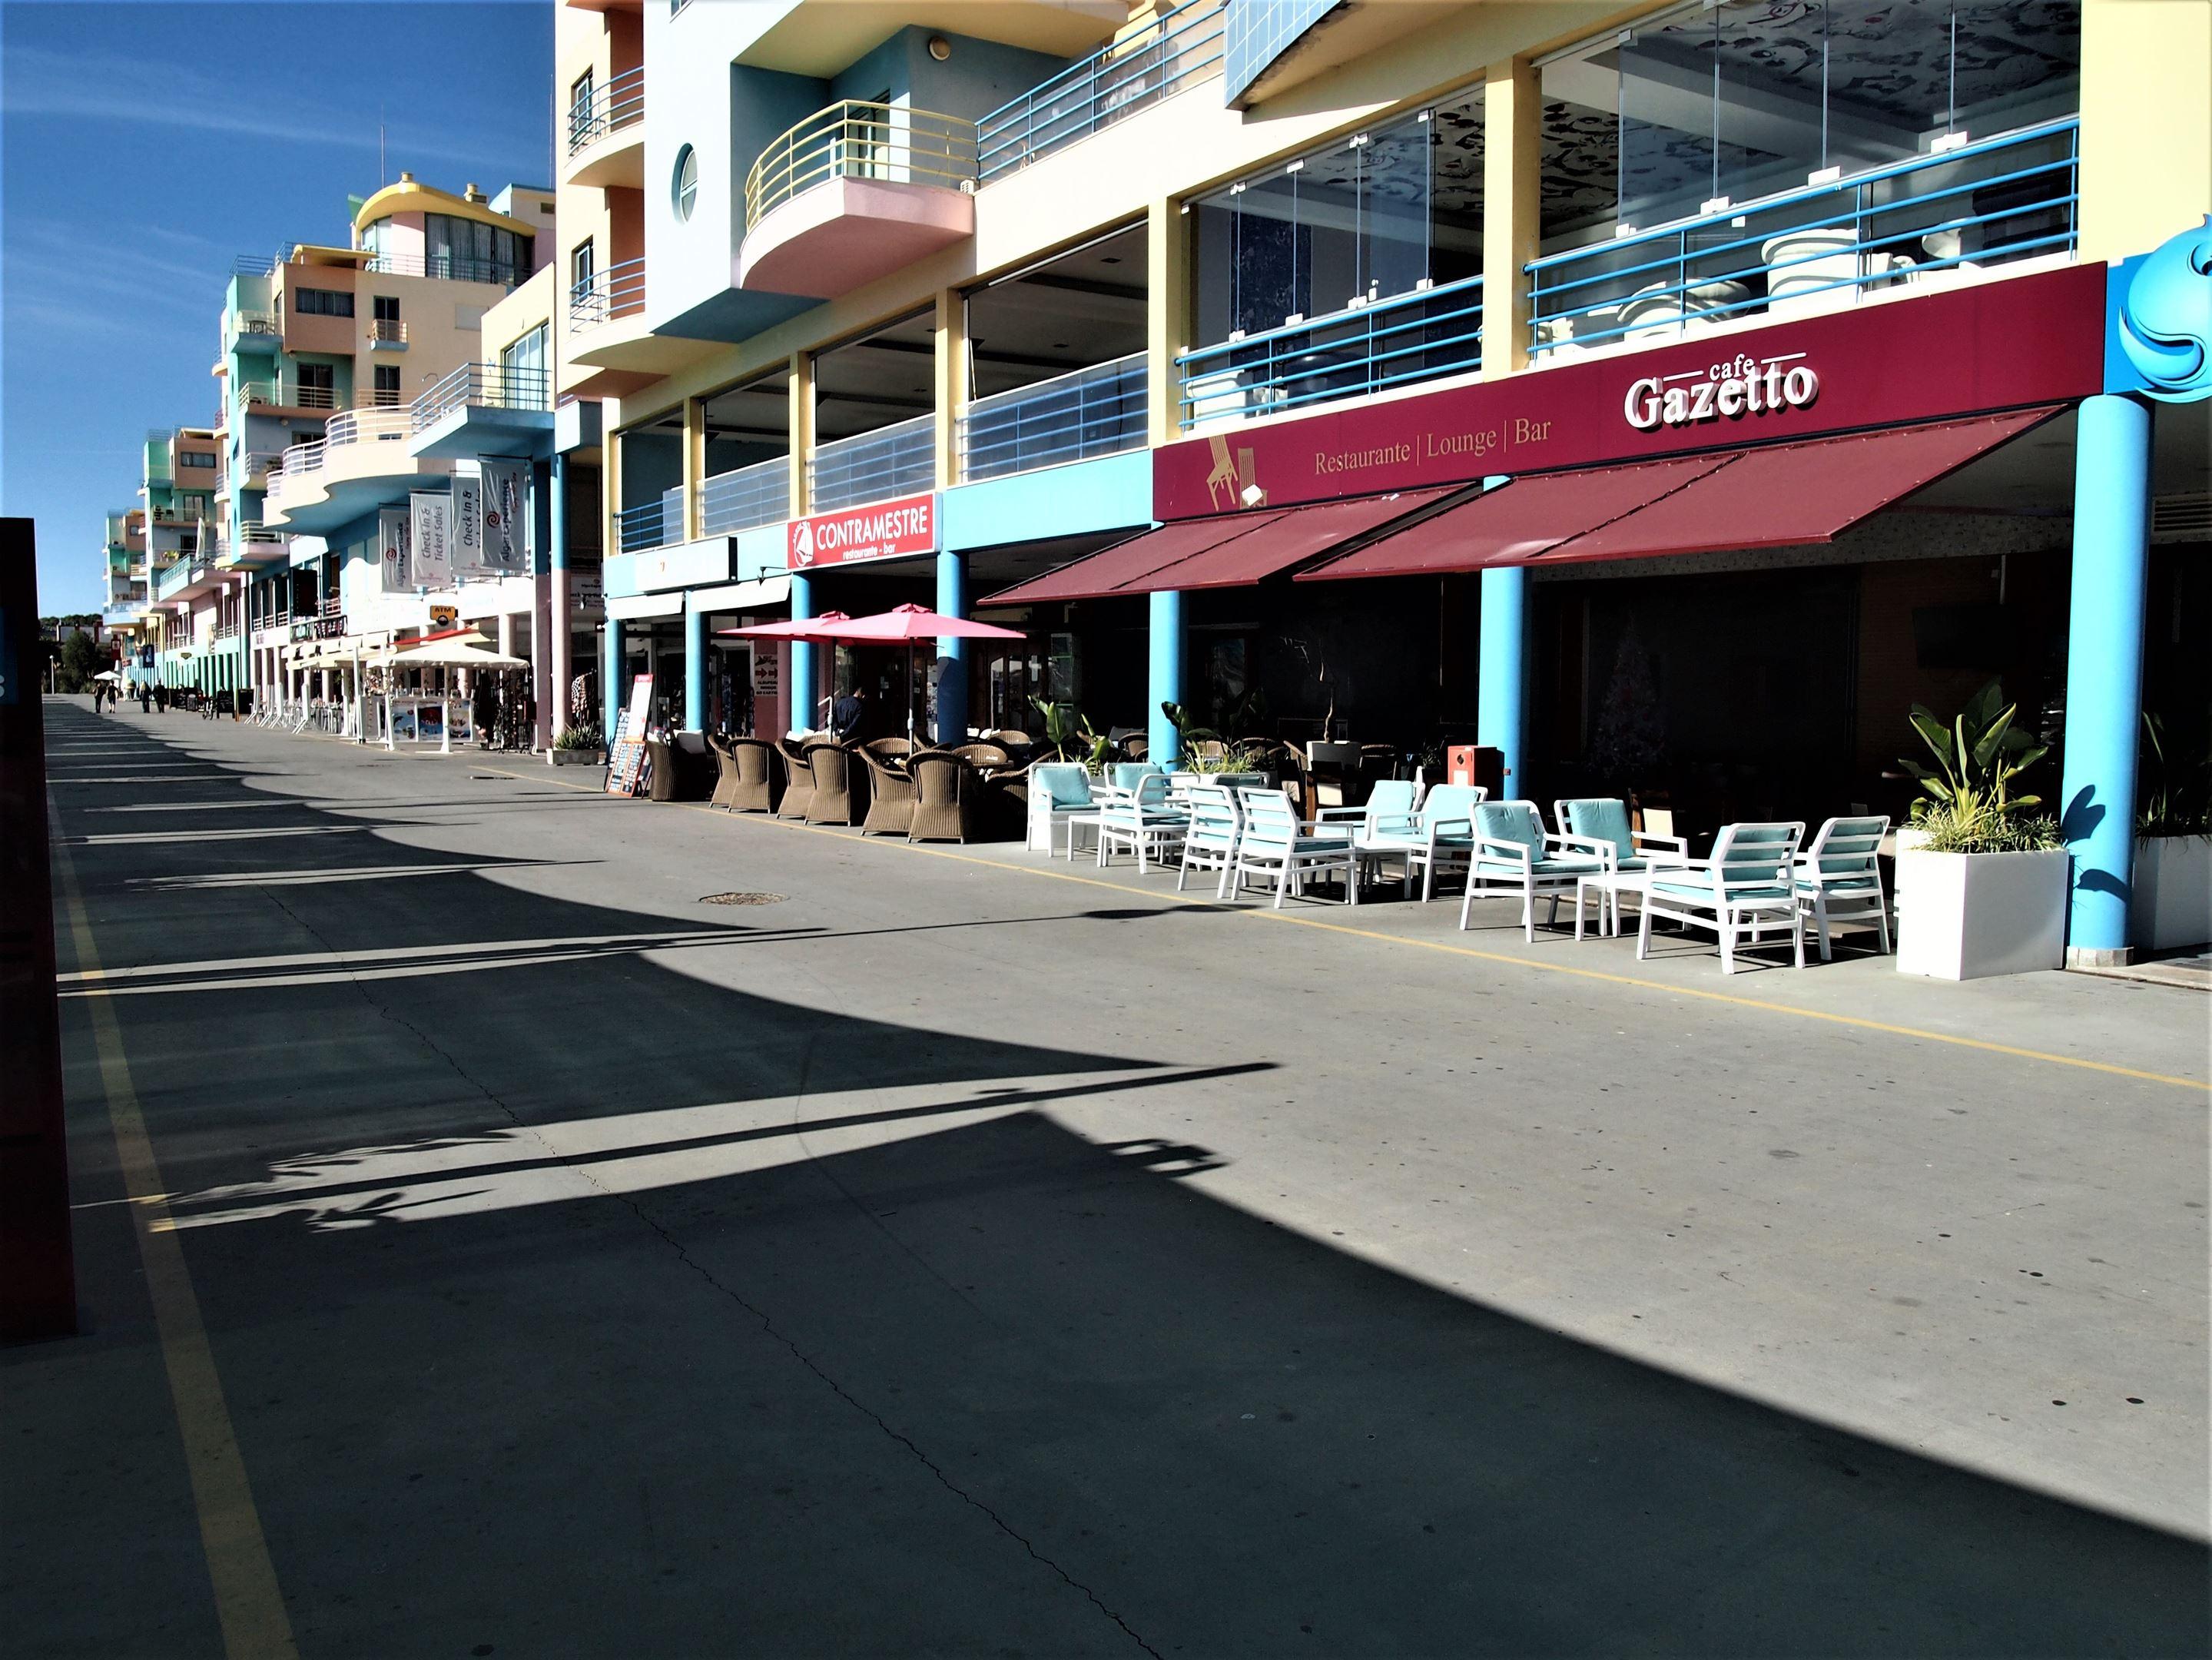 Café Gazetto, Albufeira Marina